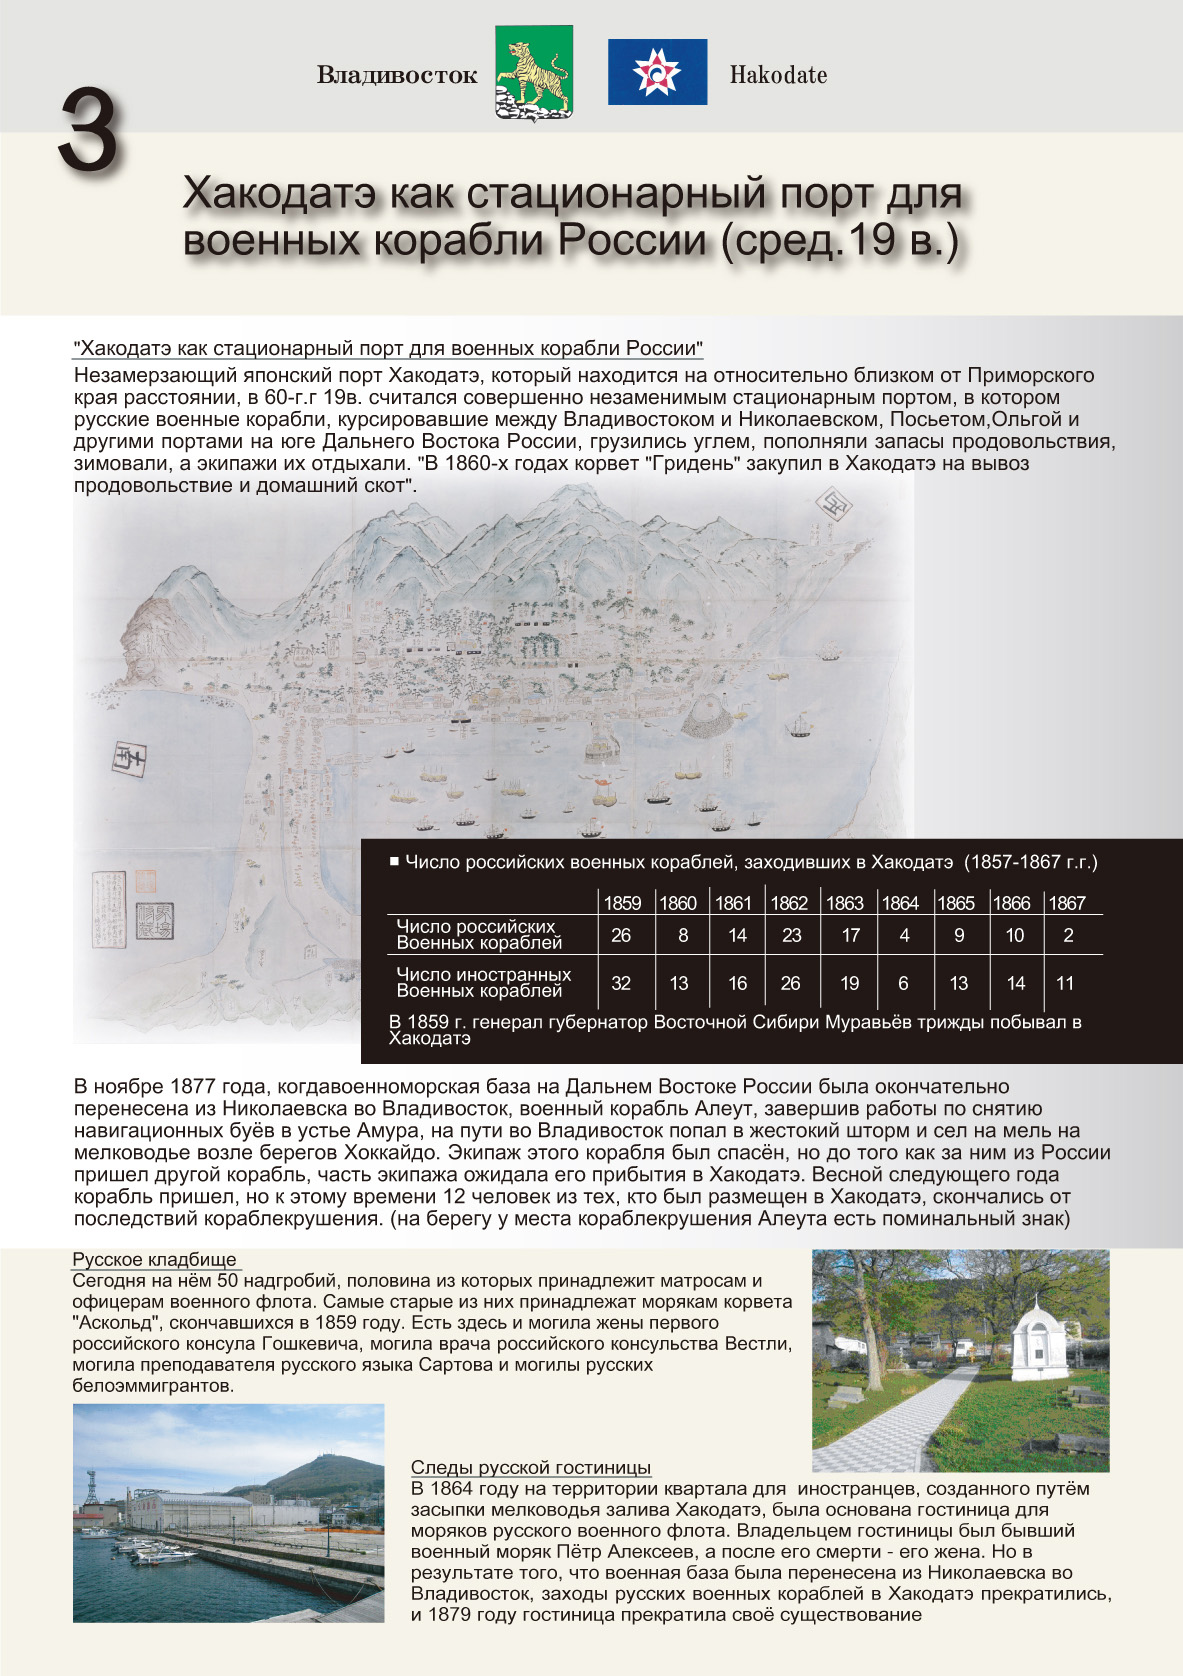 http://hakodate-russia.com/main/image/2011-panel03.jpg